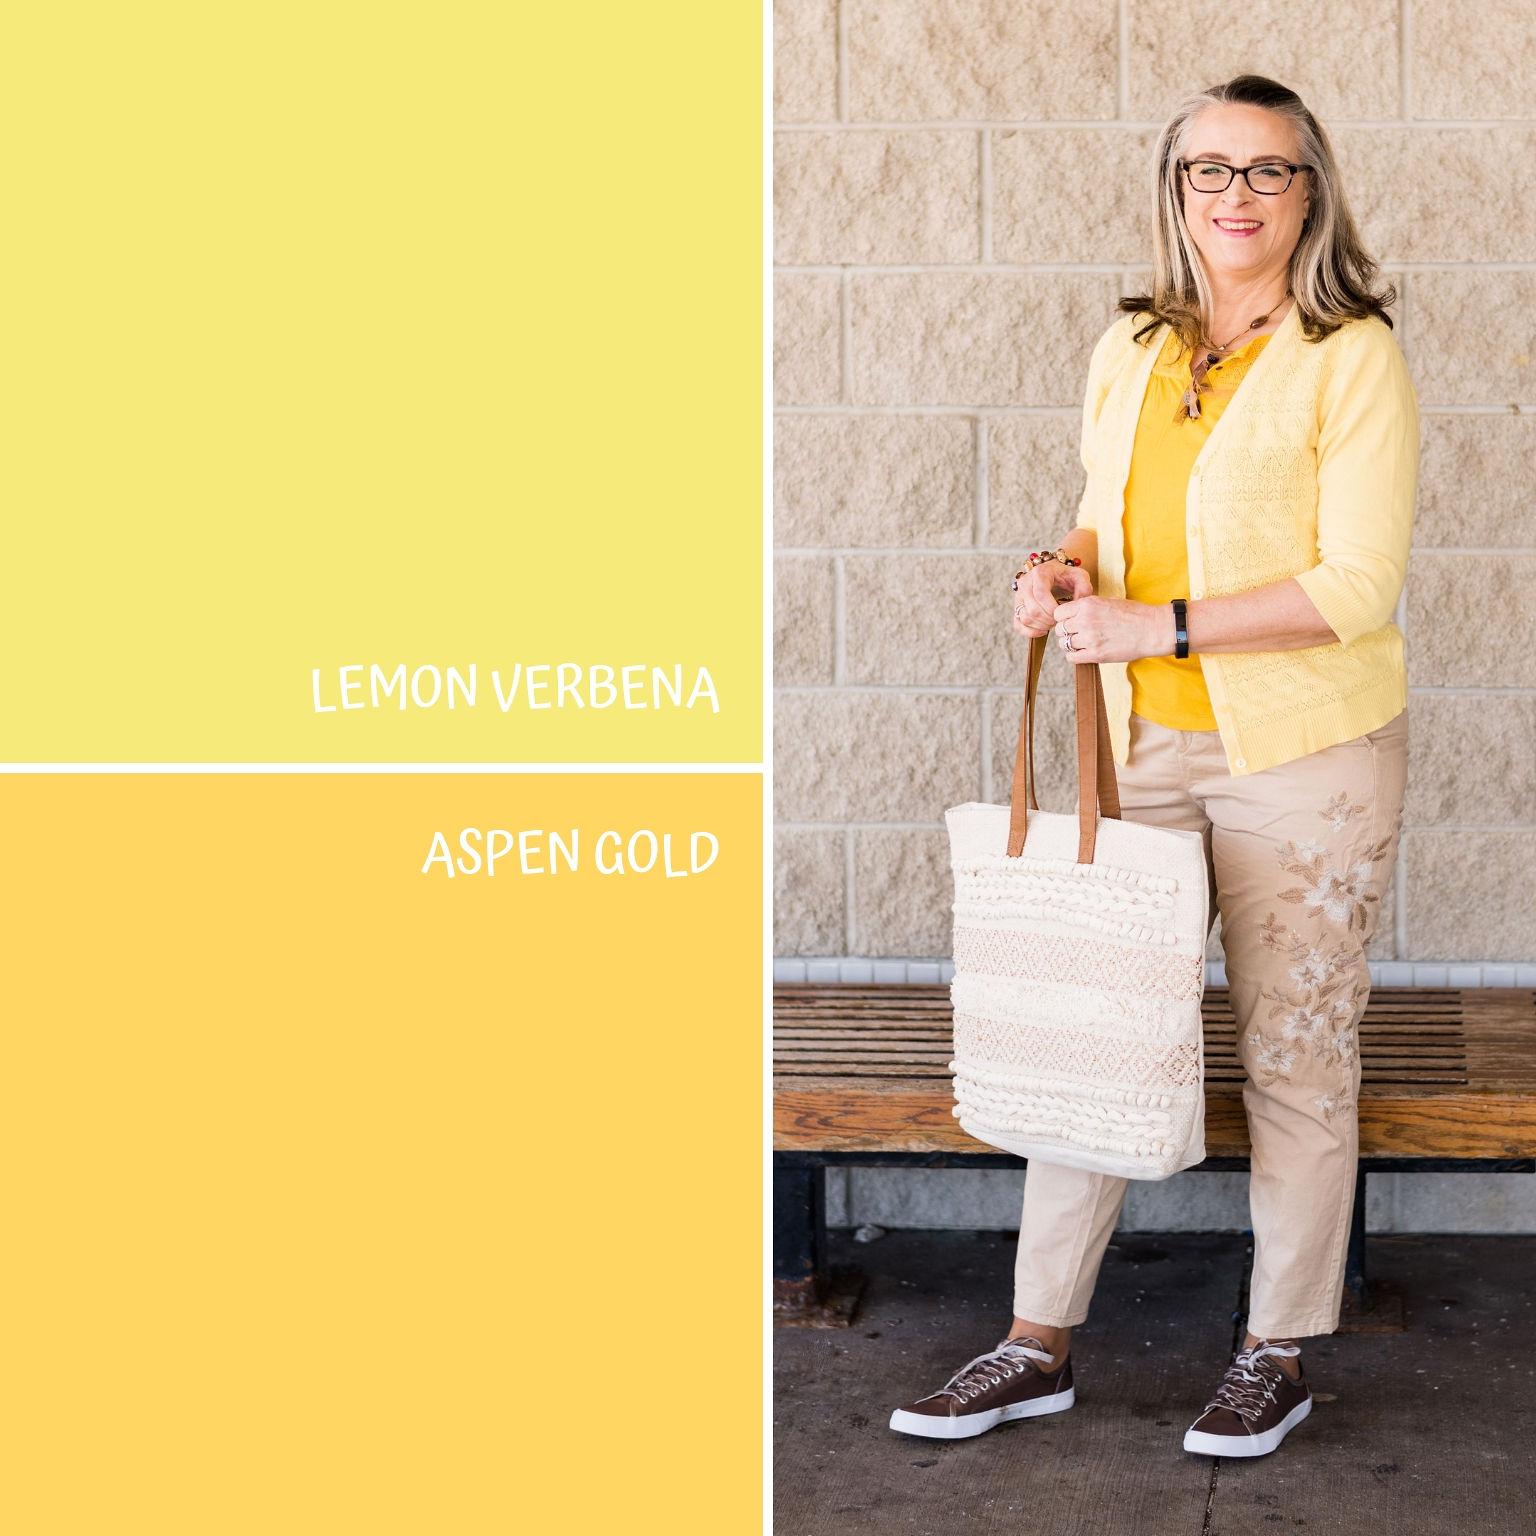 Pantone Spring/Summer - 2019 - Lemon Verbena & Aspen Gold